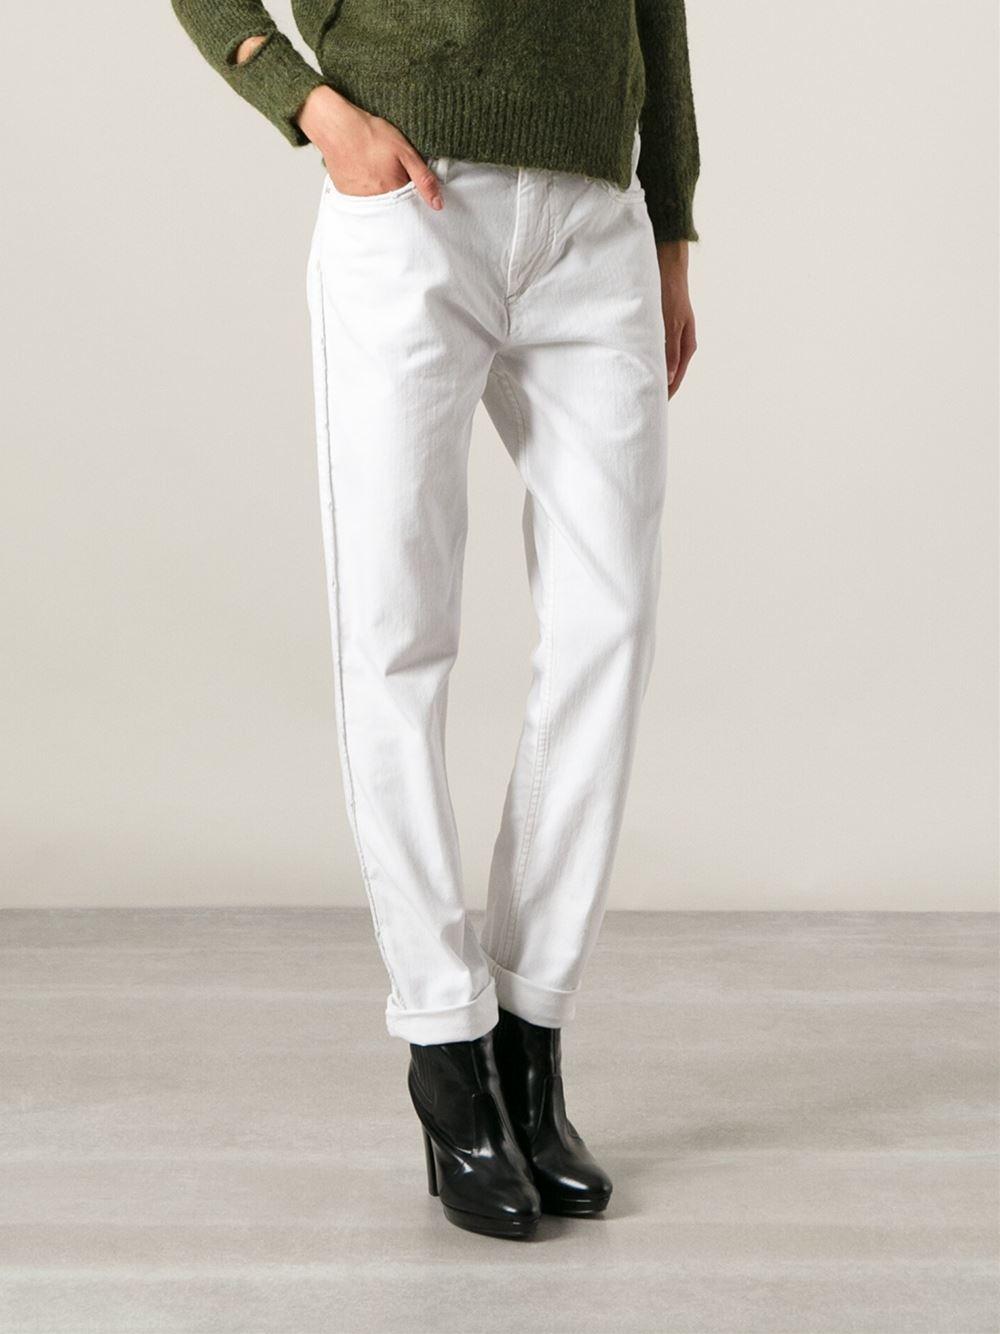 Étoile isabel marant Straight Leg Jeans in White | Lyst